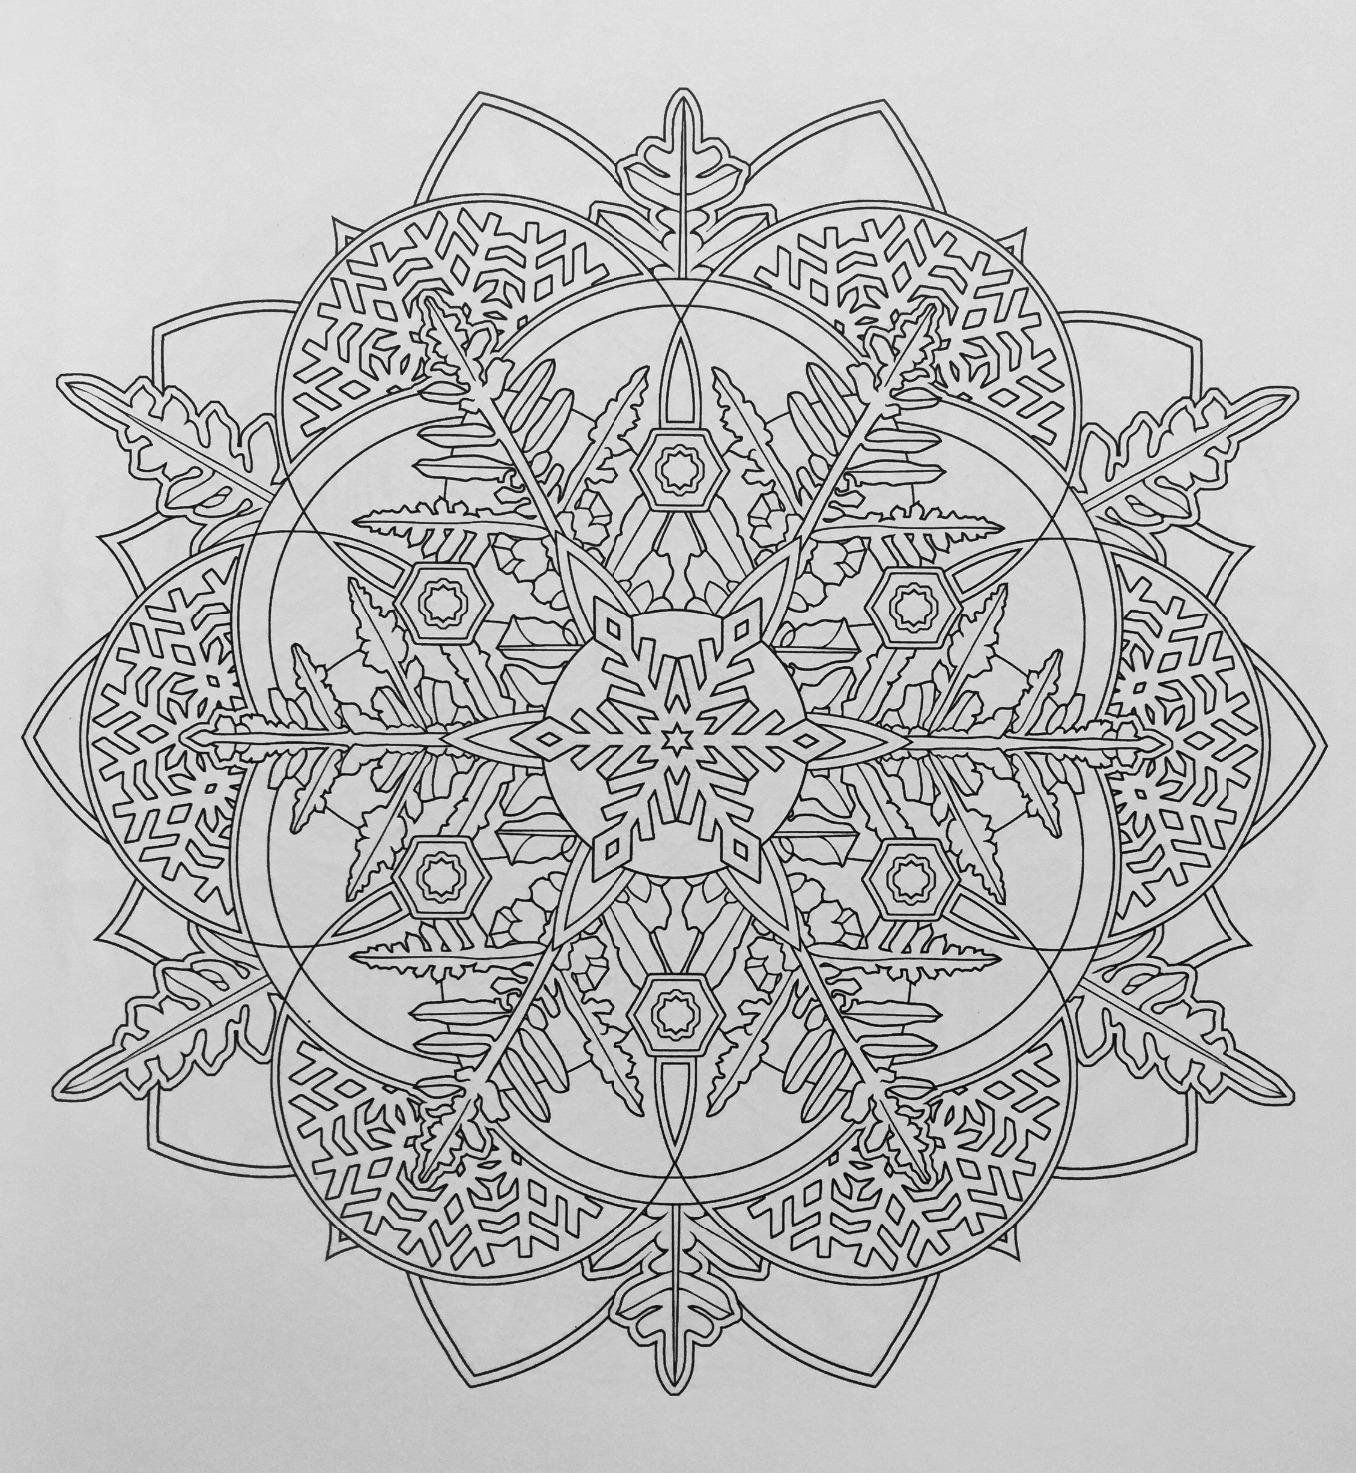 Creative Haven Snowflake Mandalas Coloring Book Books Marty Noble